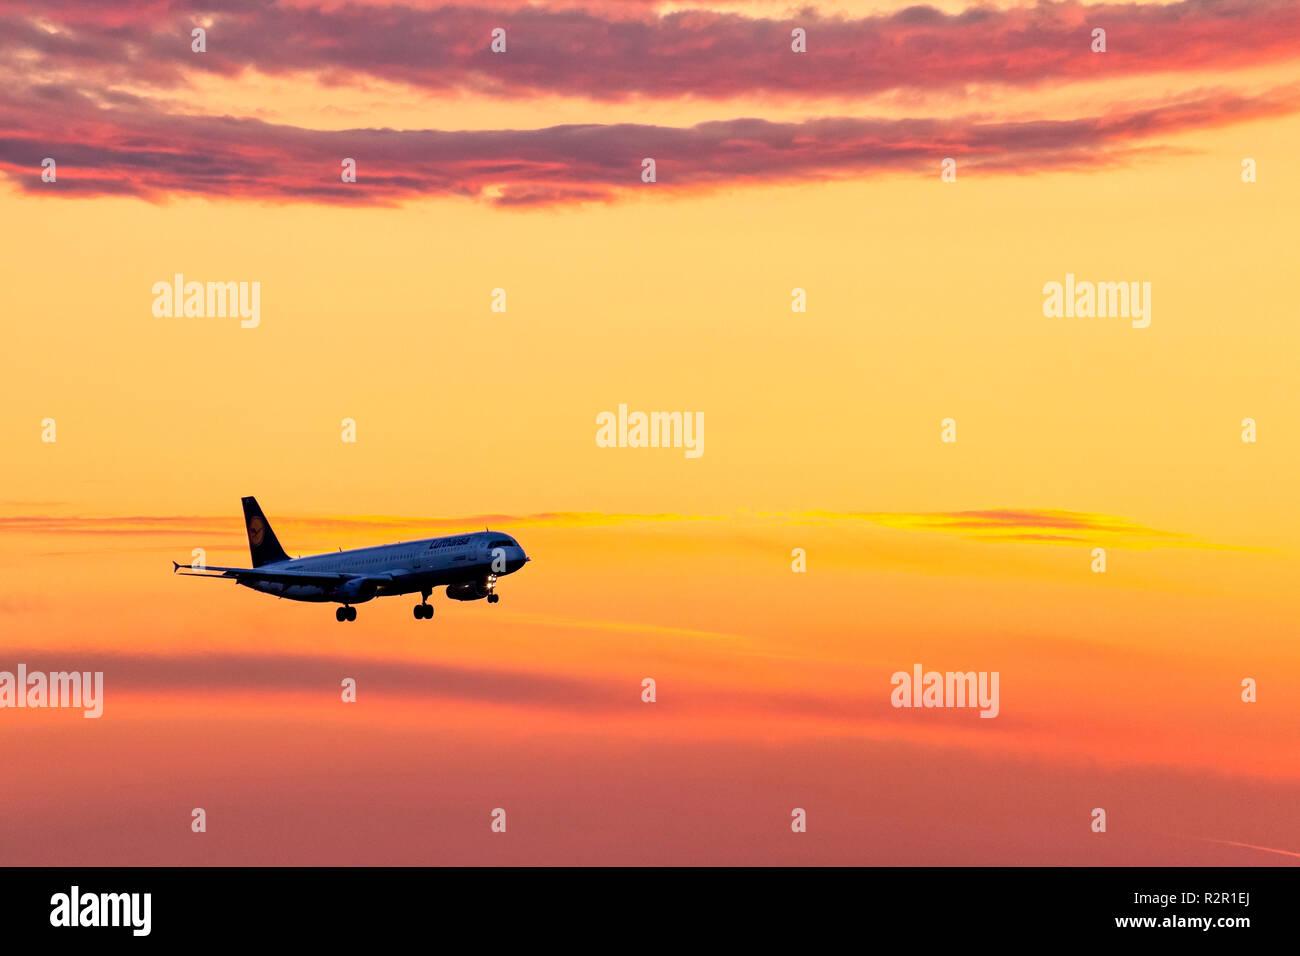 Lufthansa plane preparing landing on Munich Airport during a beautiful sunset. Munich Airport, Flughafen München, Franz Josef Strauss, near Freising / Erding, Erdinger Moos, Oberbayern (Upper Bavaria), Germany - Stock Image